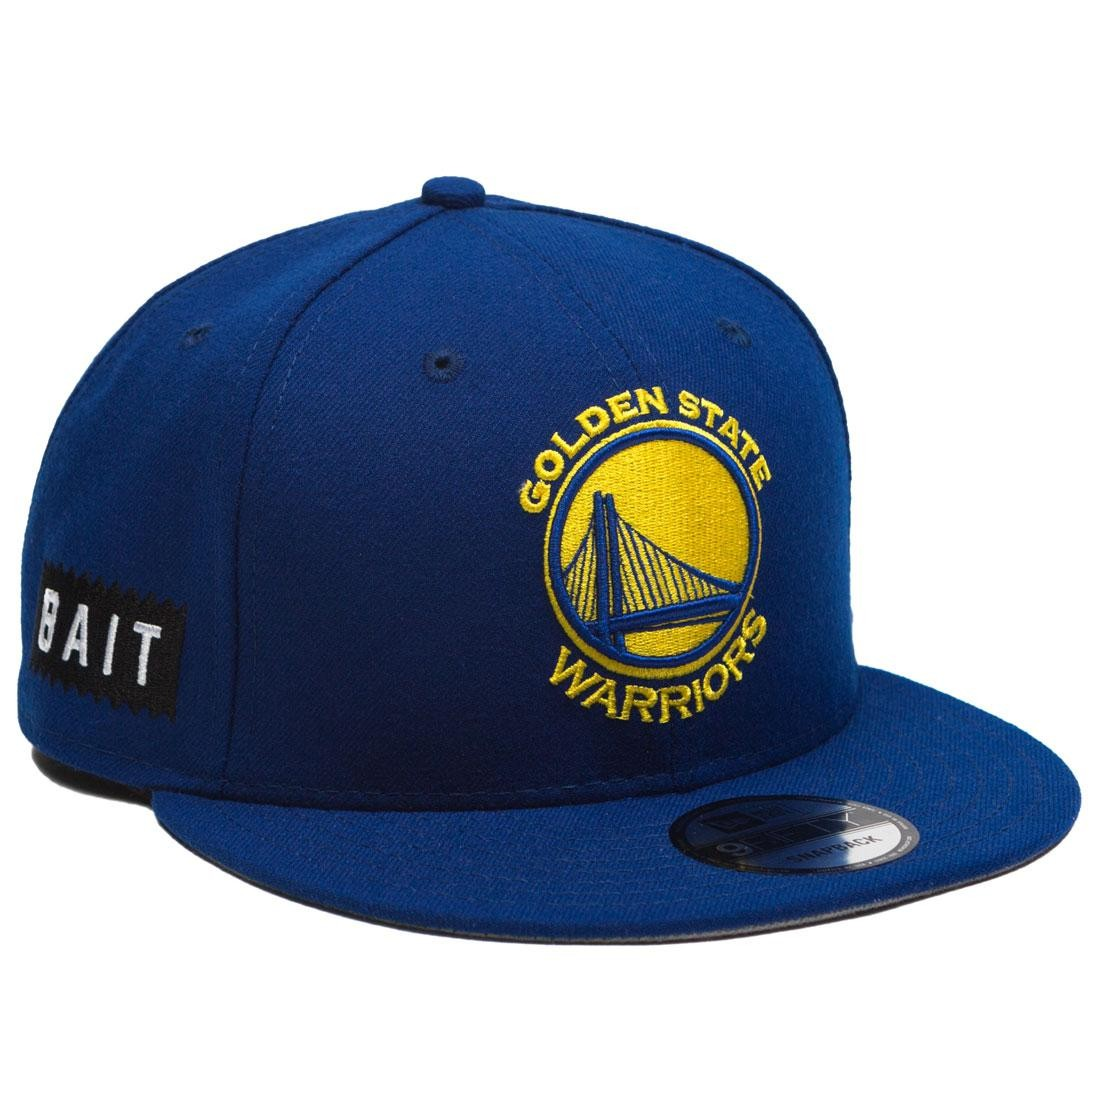 big sale 833d0 cd8f7 ... order bait x nba x new era 9fifty golden state warriors otc snapback  cap blue b39bf